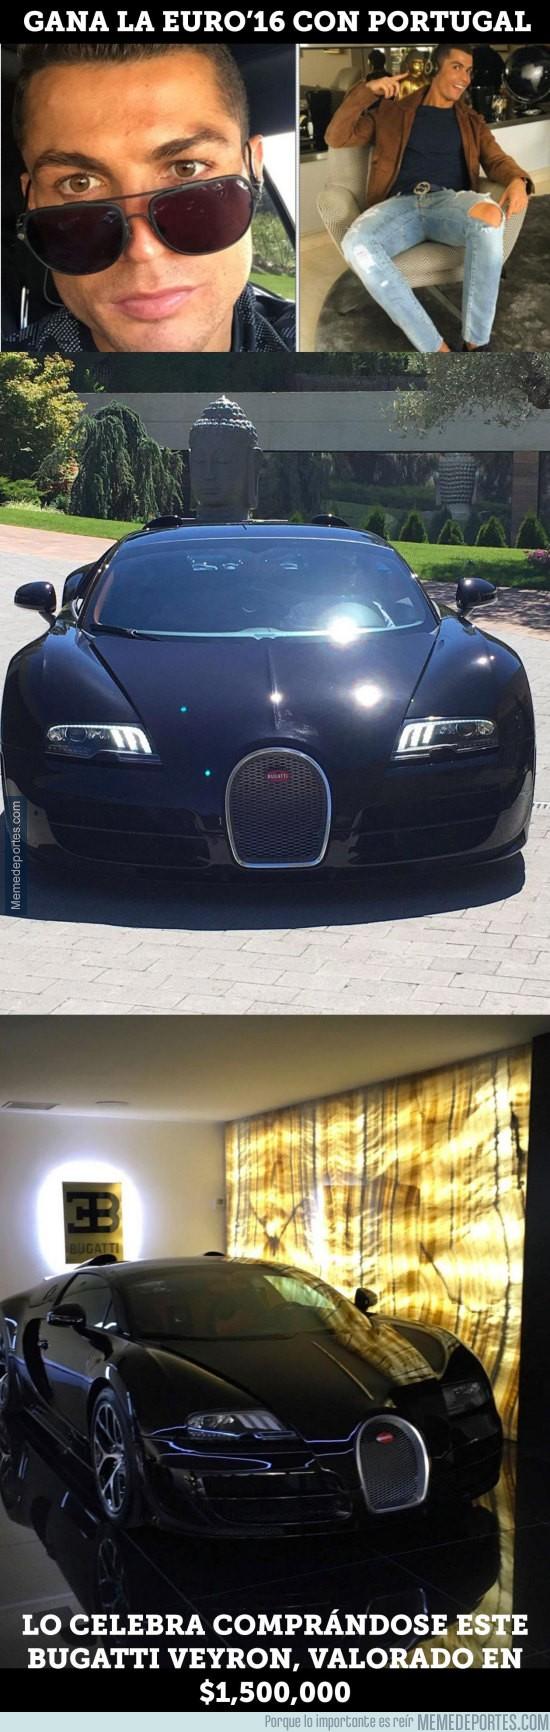 890226 - Cristiano celebra la Euro comprándose un espectacular coche de $1,500,000